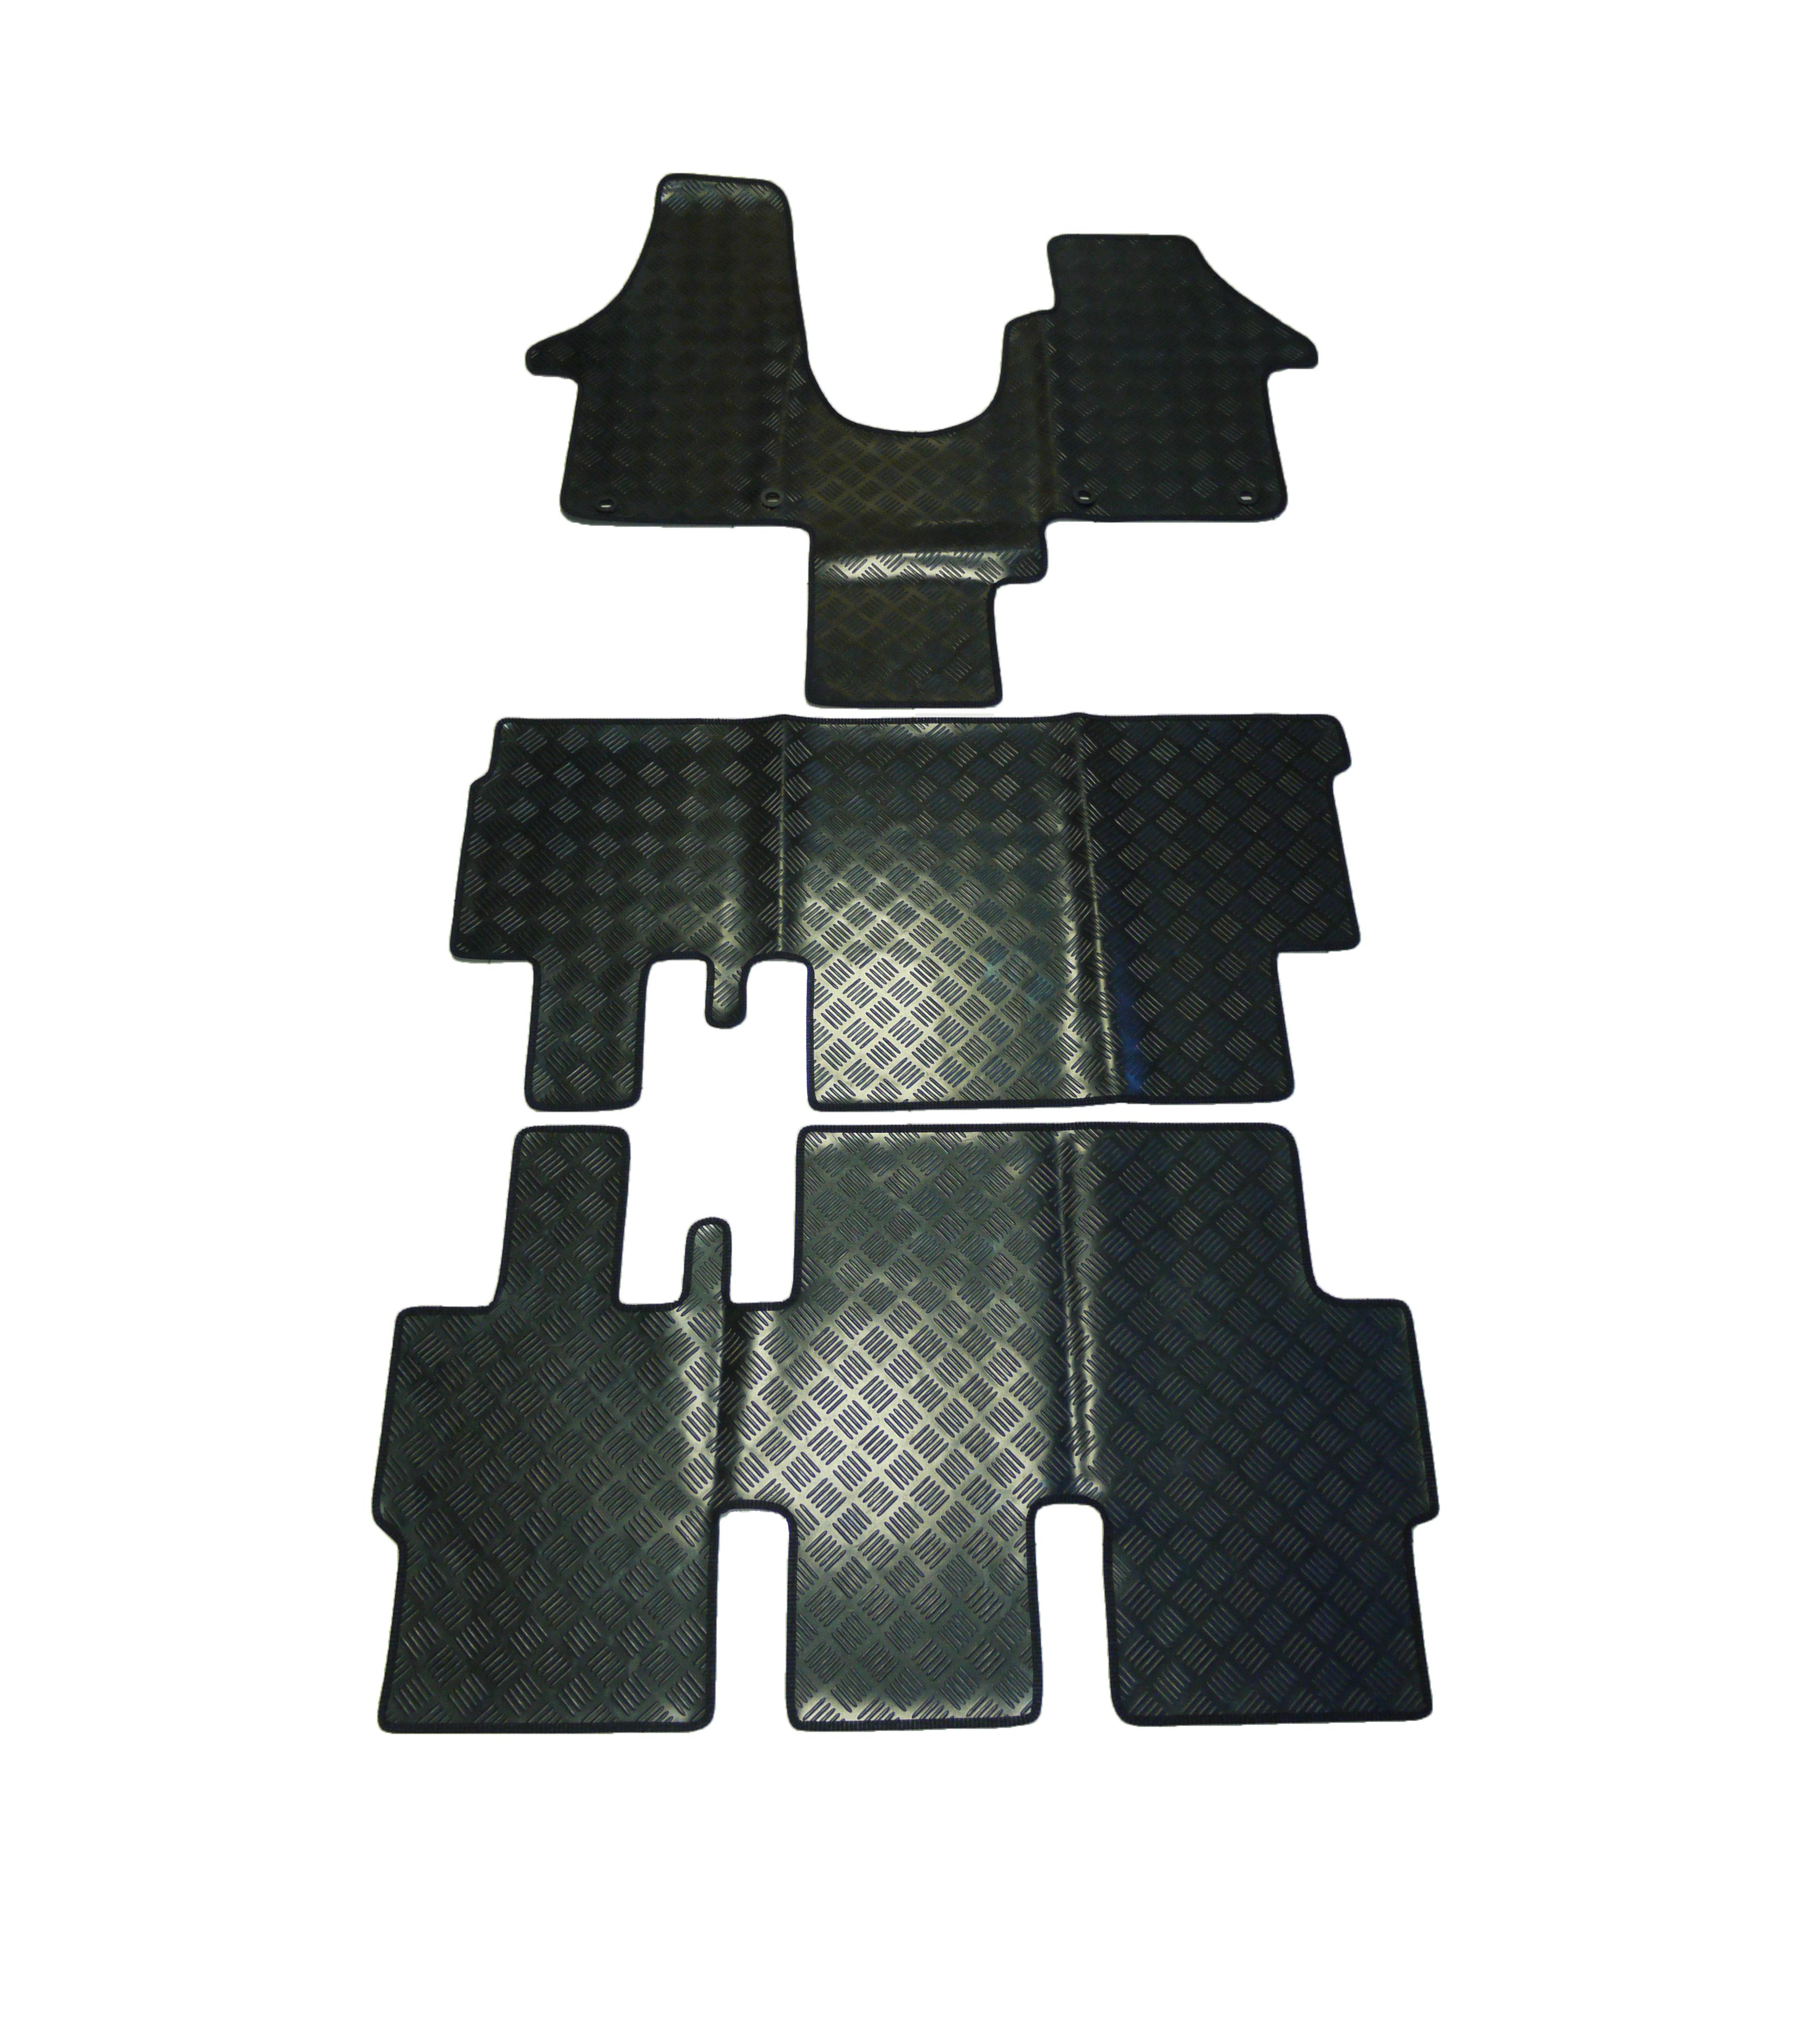 Rubber floor mat jigsaw - Heavy Duty Black Rubber Floor Mats Vw T5 Shuttle 03 15 Single Passenger Seat